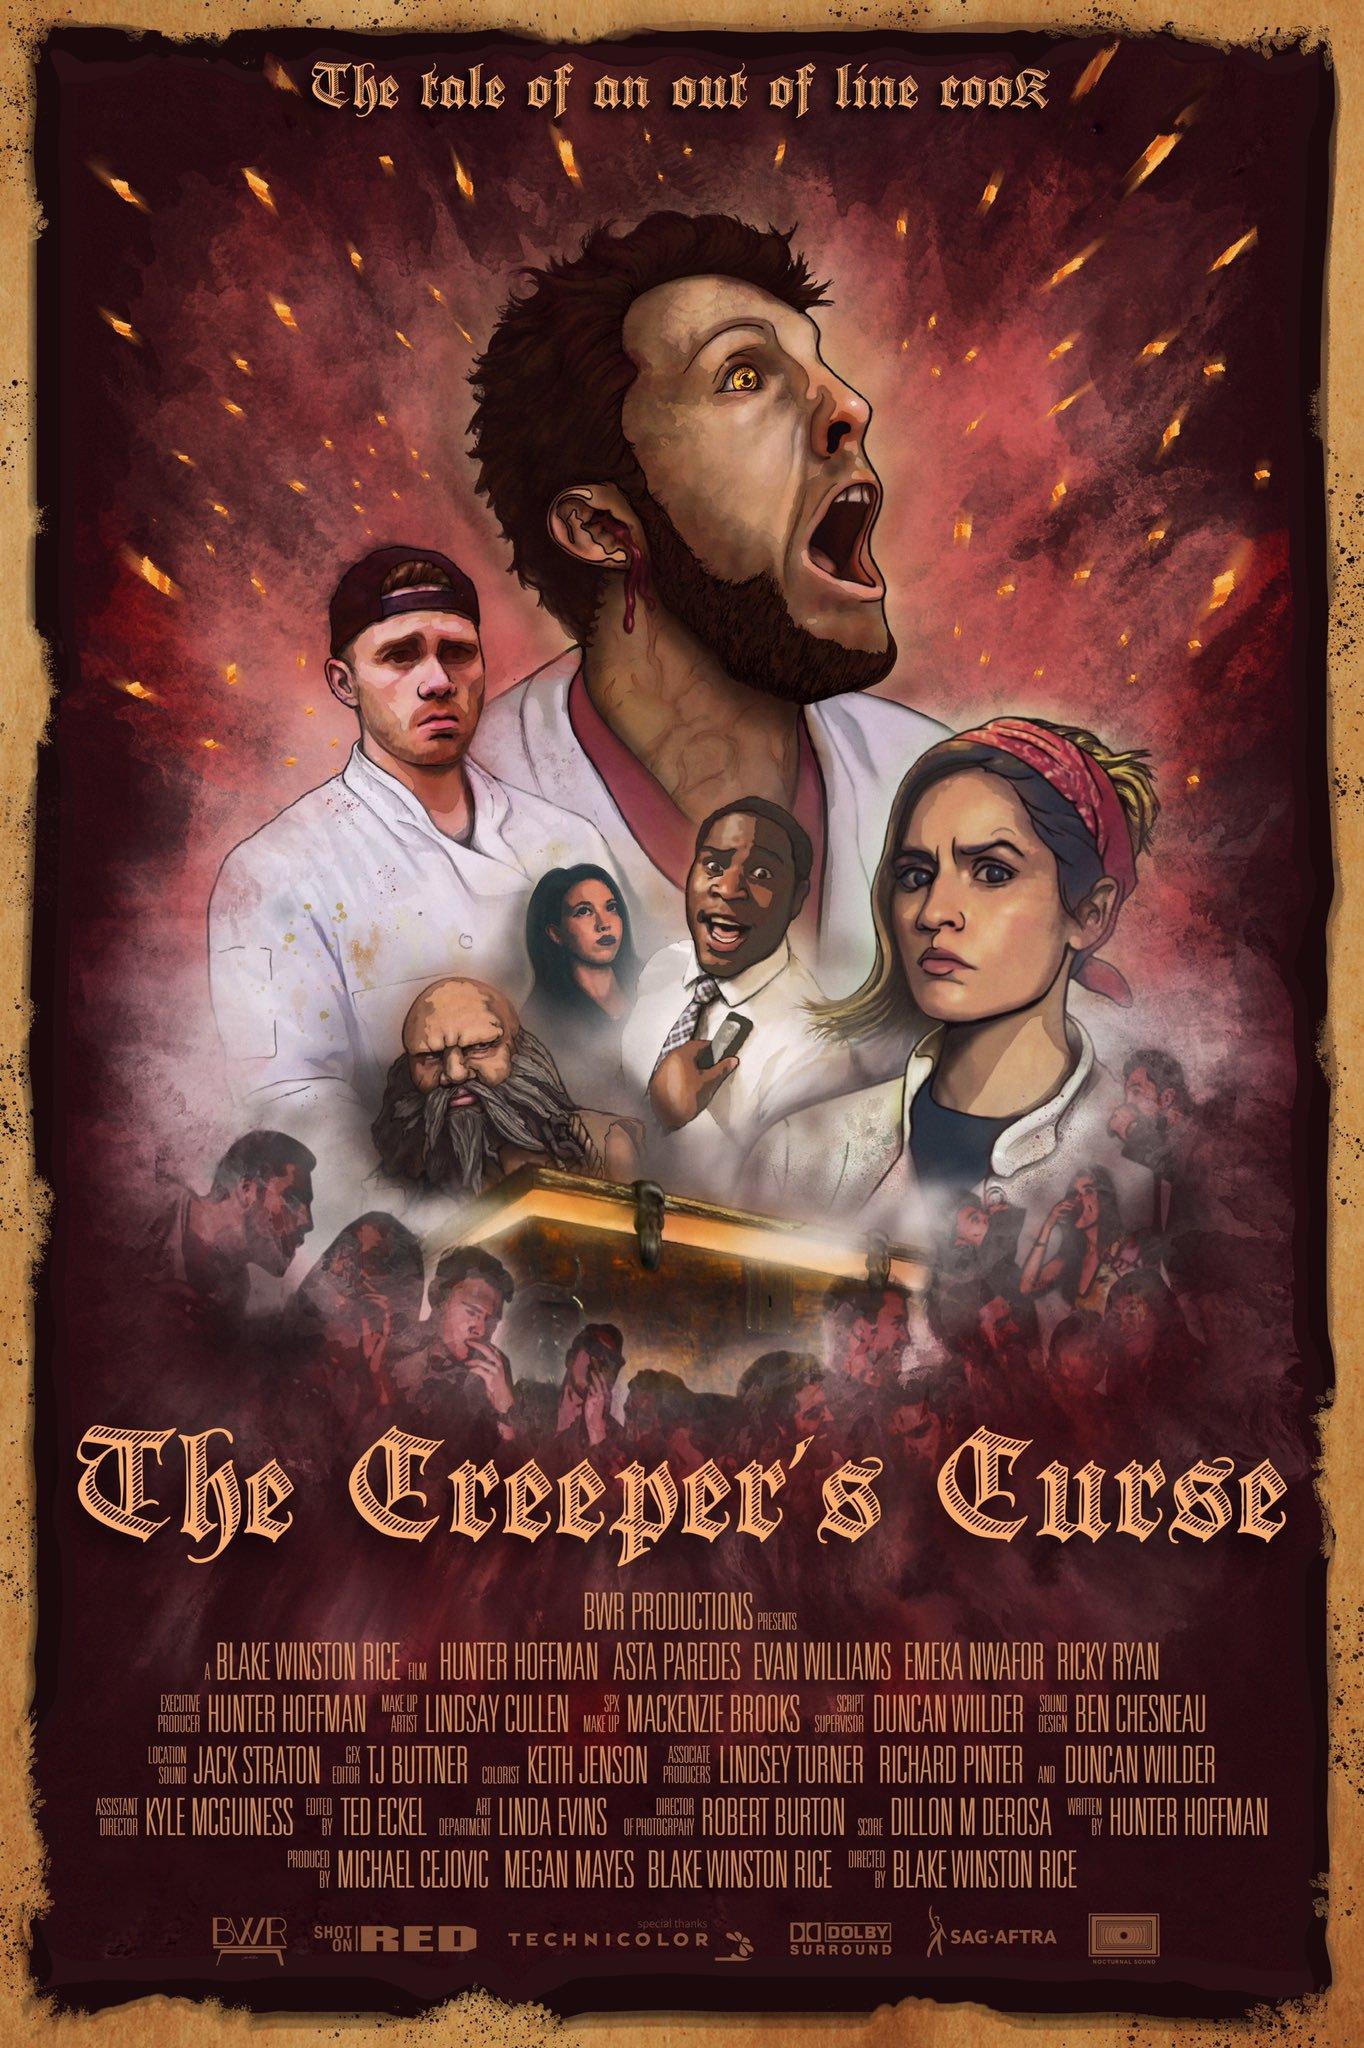 Curse Official, Hunter Hoffman, Creeper's Curse Poster, Poster